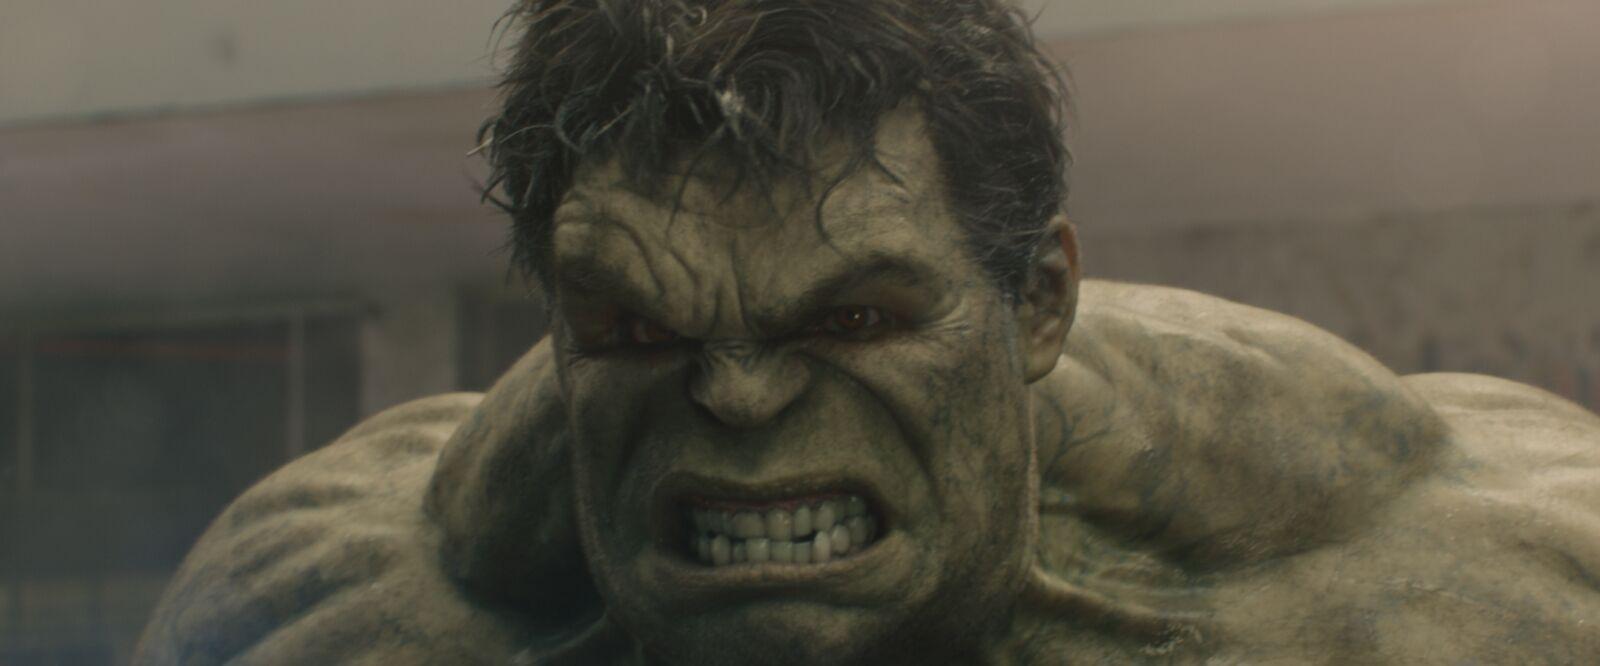 Mark Ruffalo has a problem with Boris Johnson using the Hulk to promote Brexit